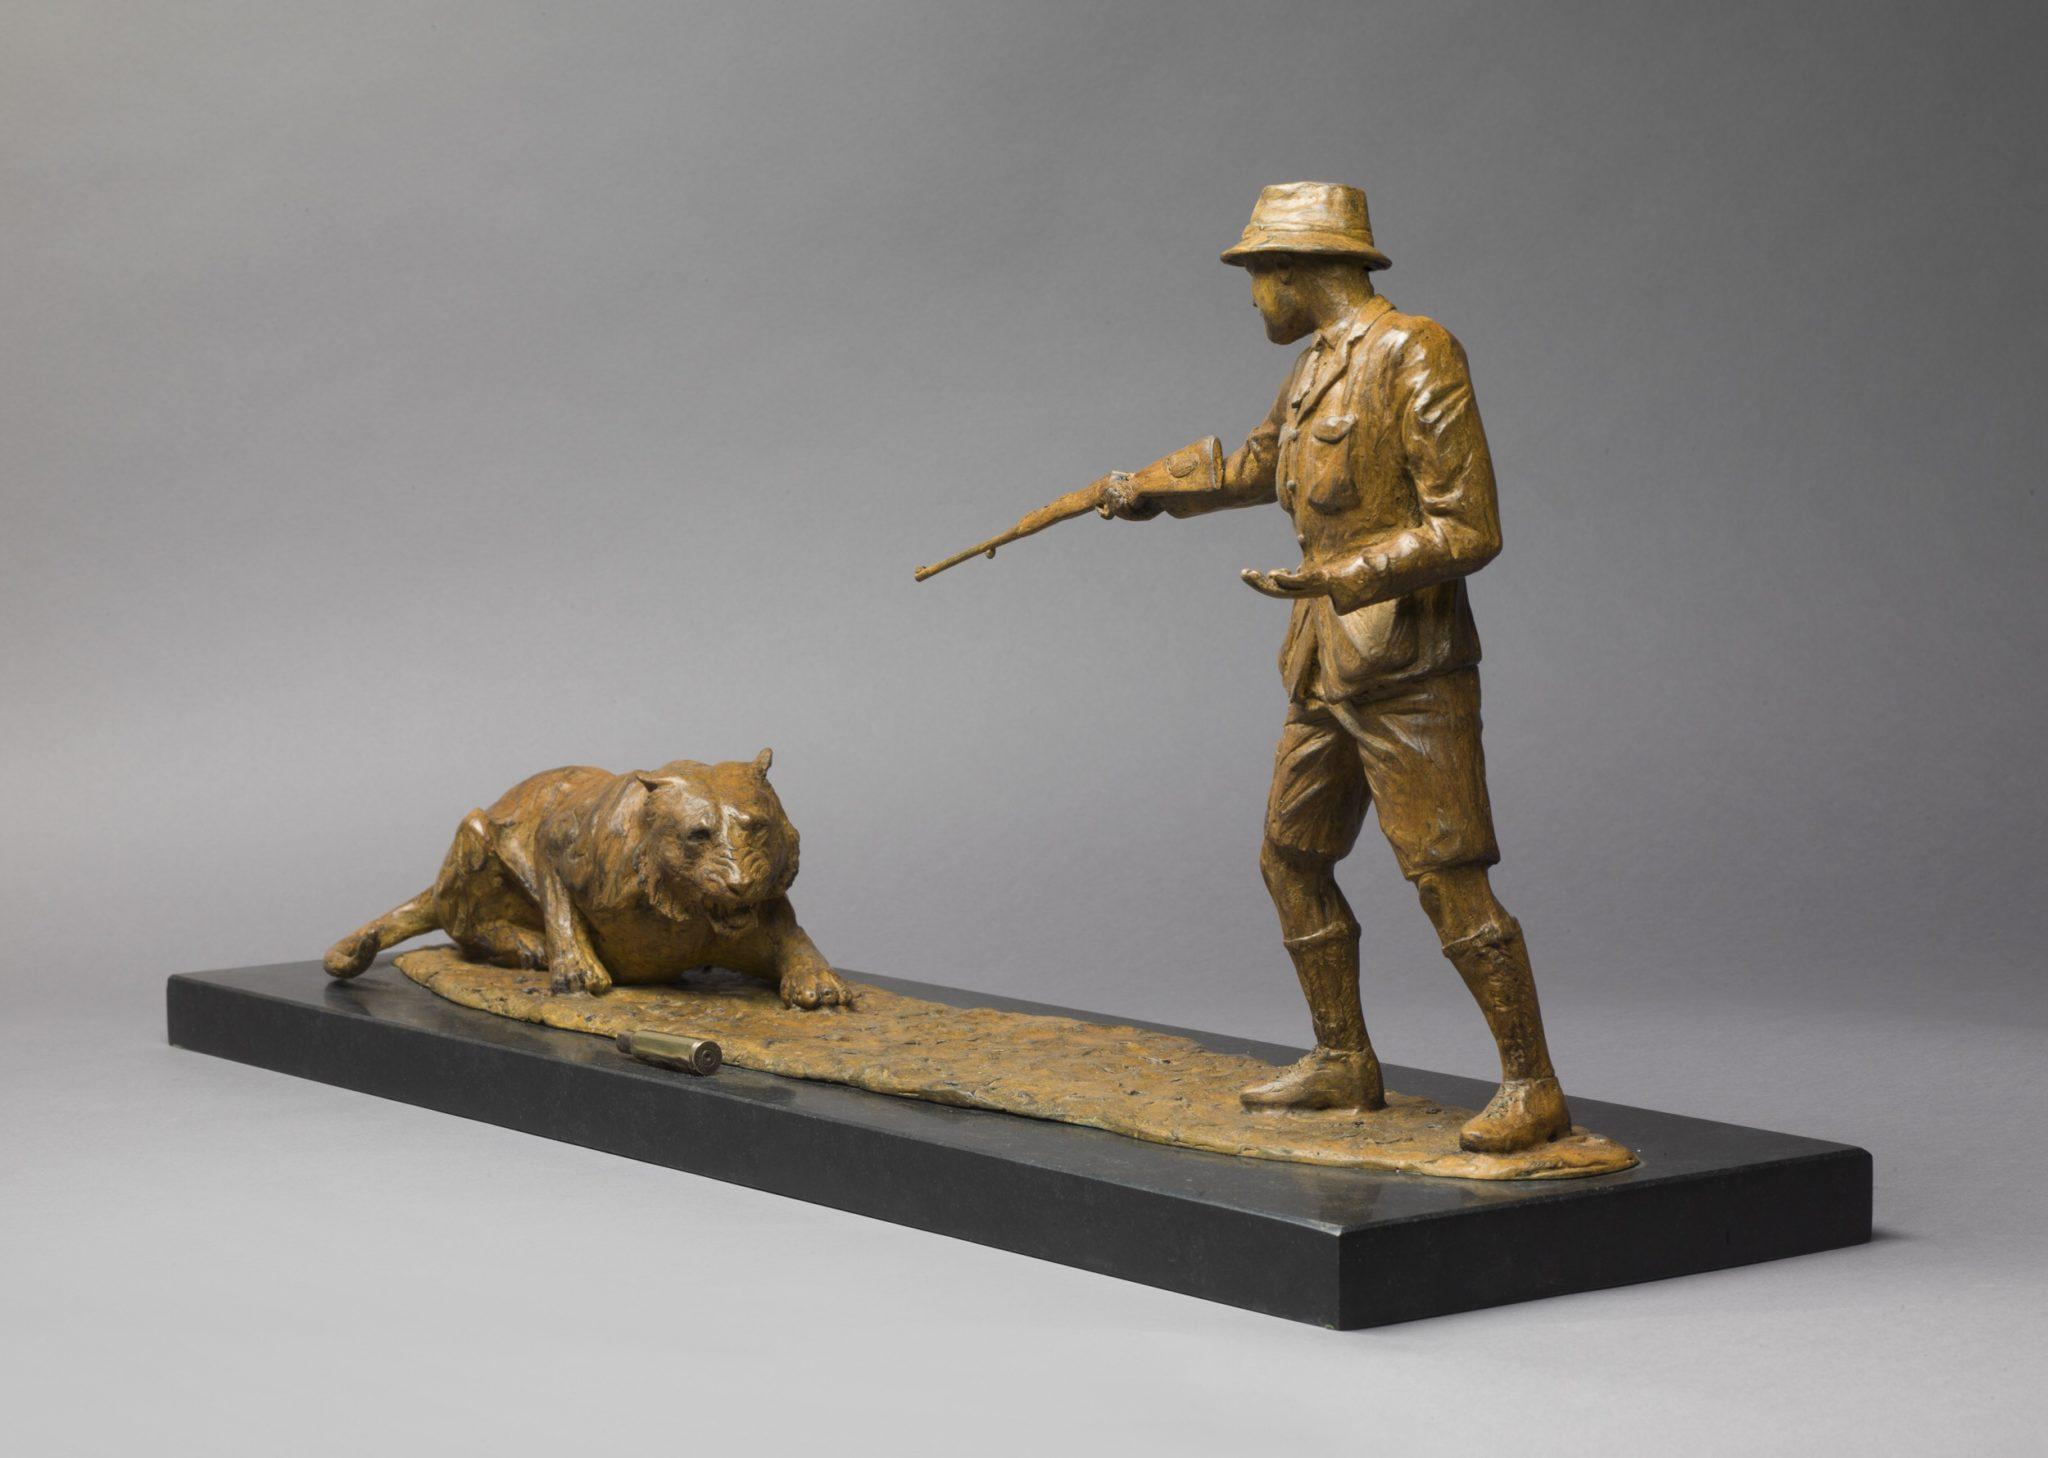 Jim Corbett limited edition bronze sculpture